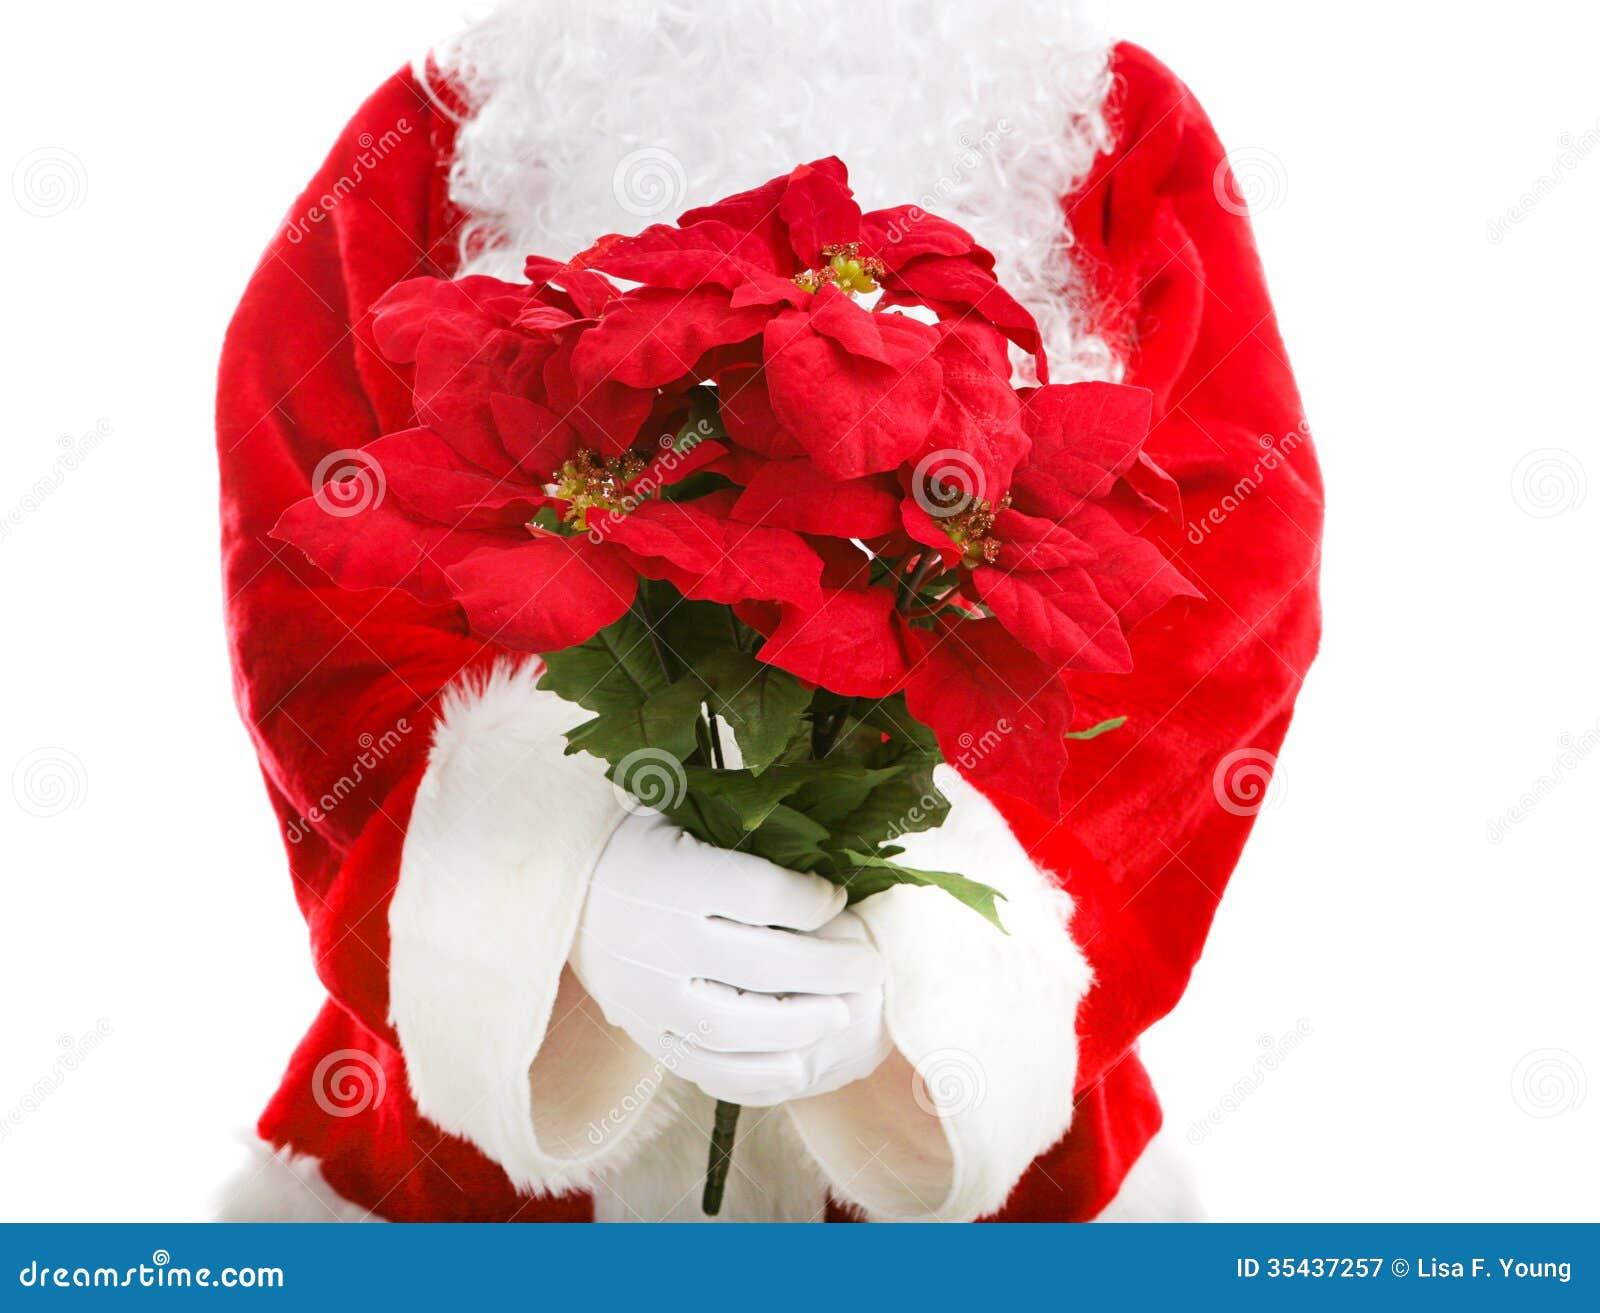 Santa claus holding poinsettias royalty free stock